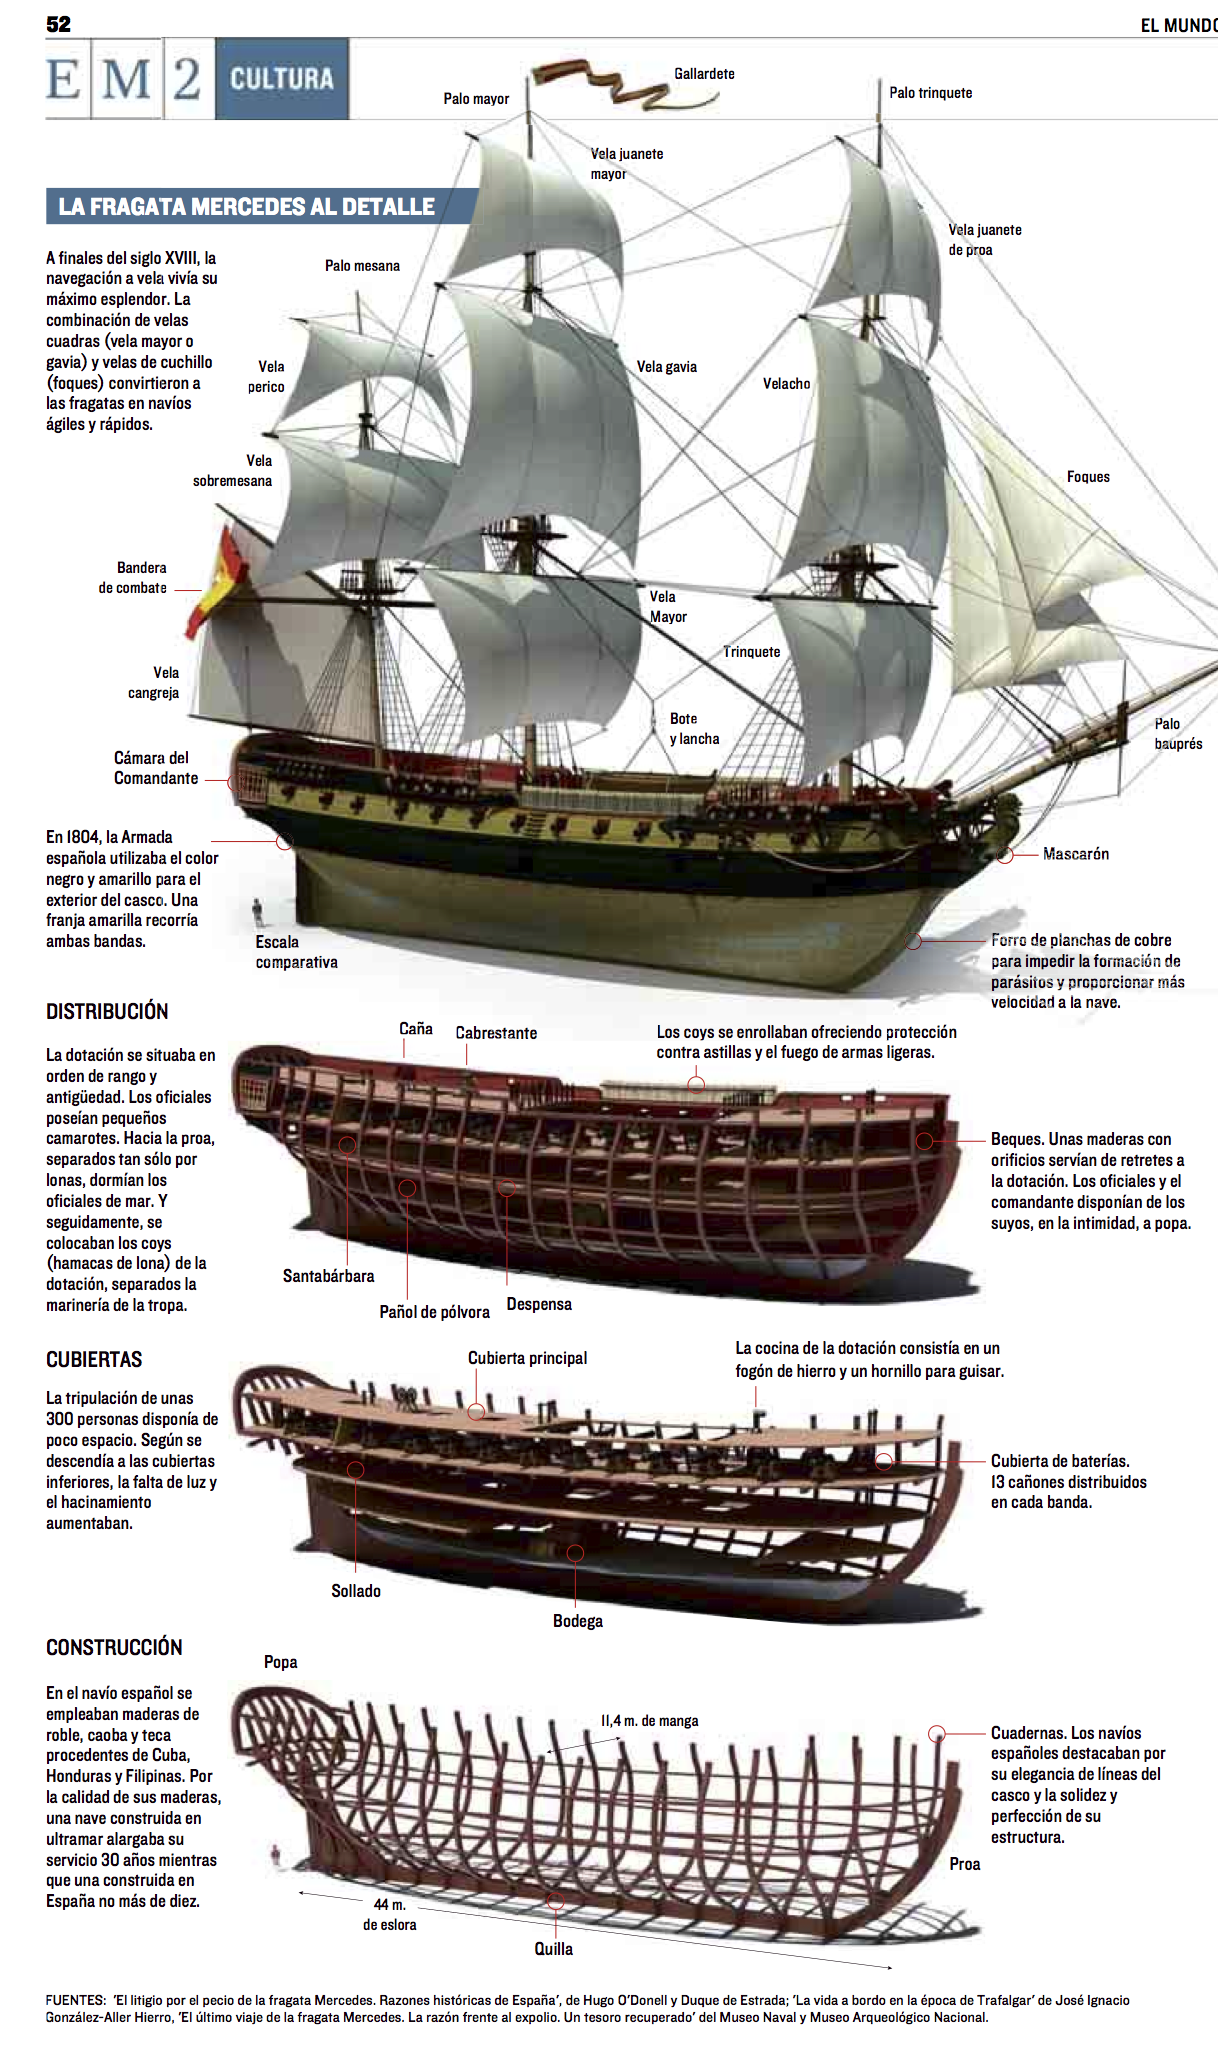 Fragata Merced - El Mundo   Sea & Boats   Old sailing ships, Model